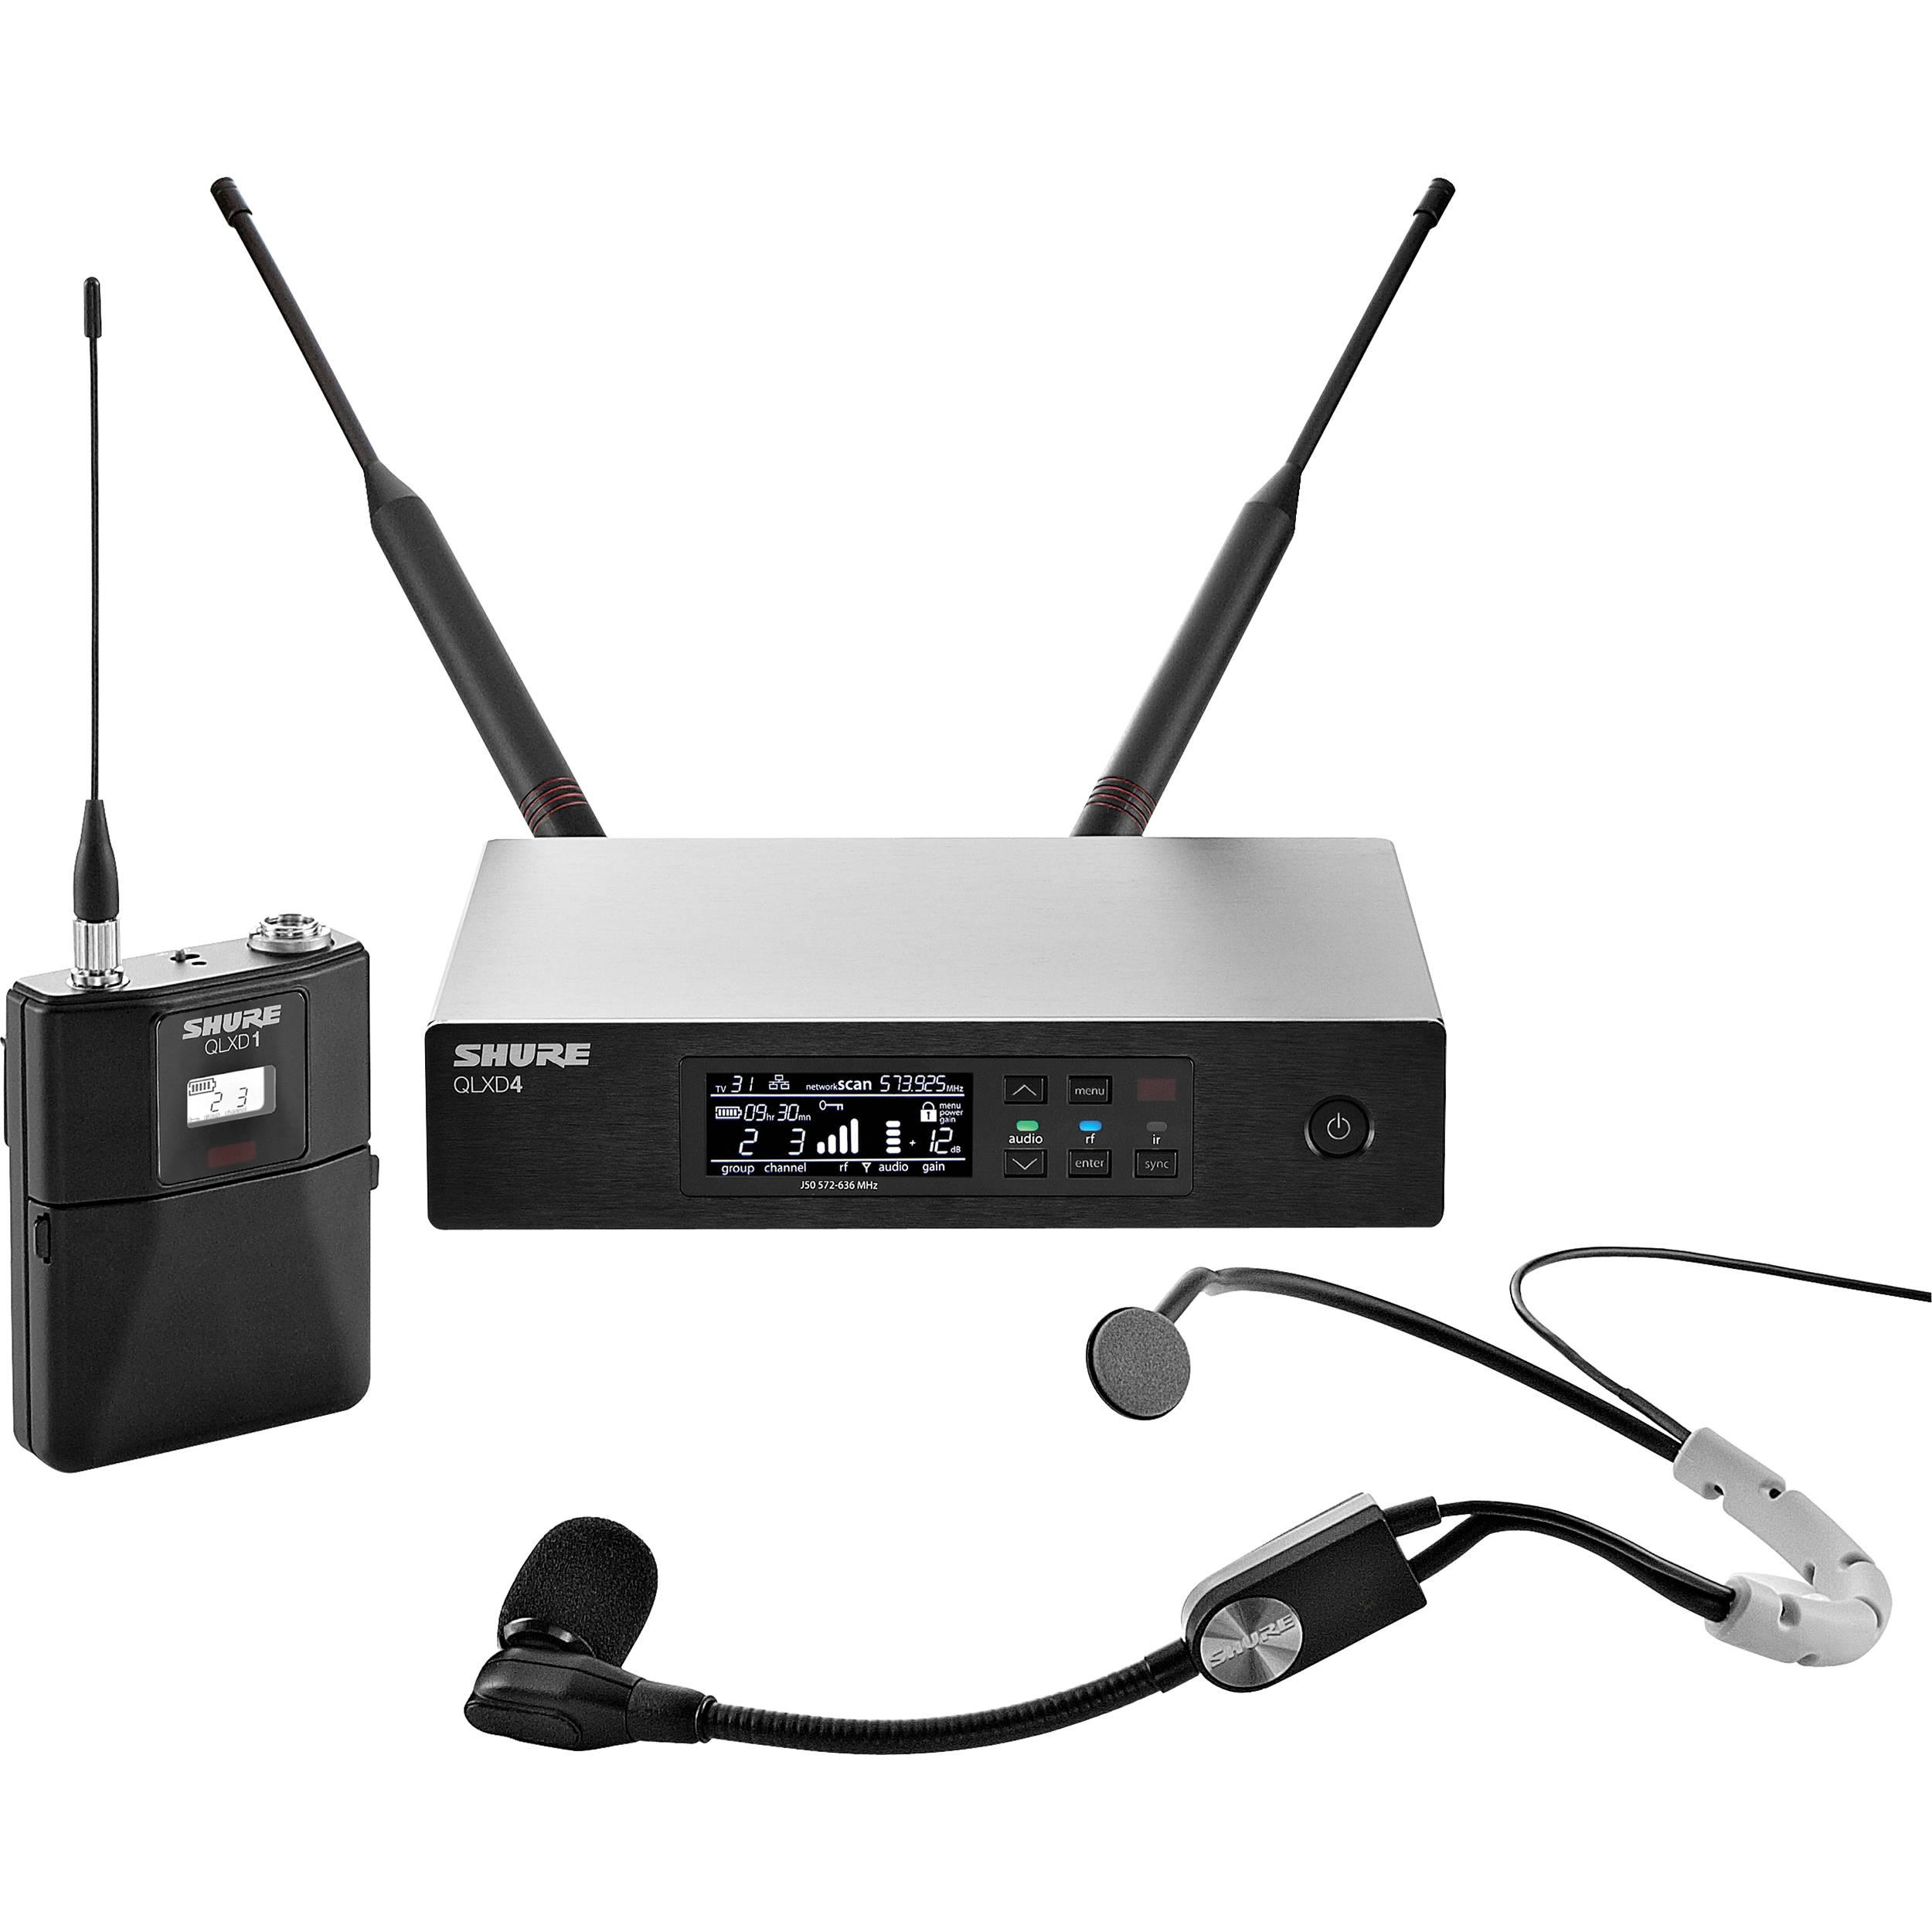 shure qlxd14 sm35 wireless headworn microphone qlxd14 sm35 h50. Black Bedroom Furniture Sets. Home Design Ideas